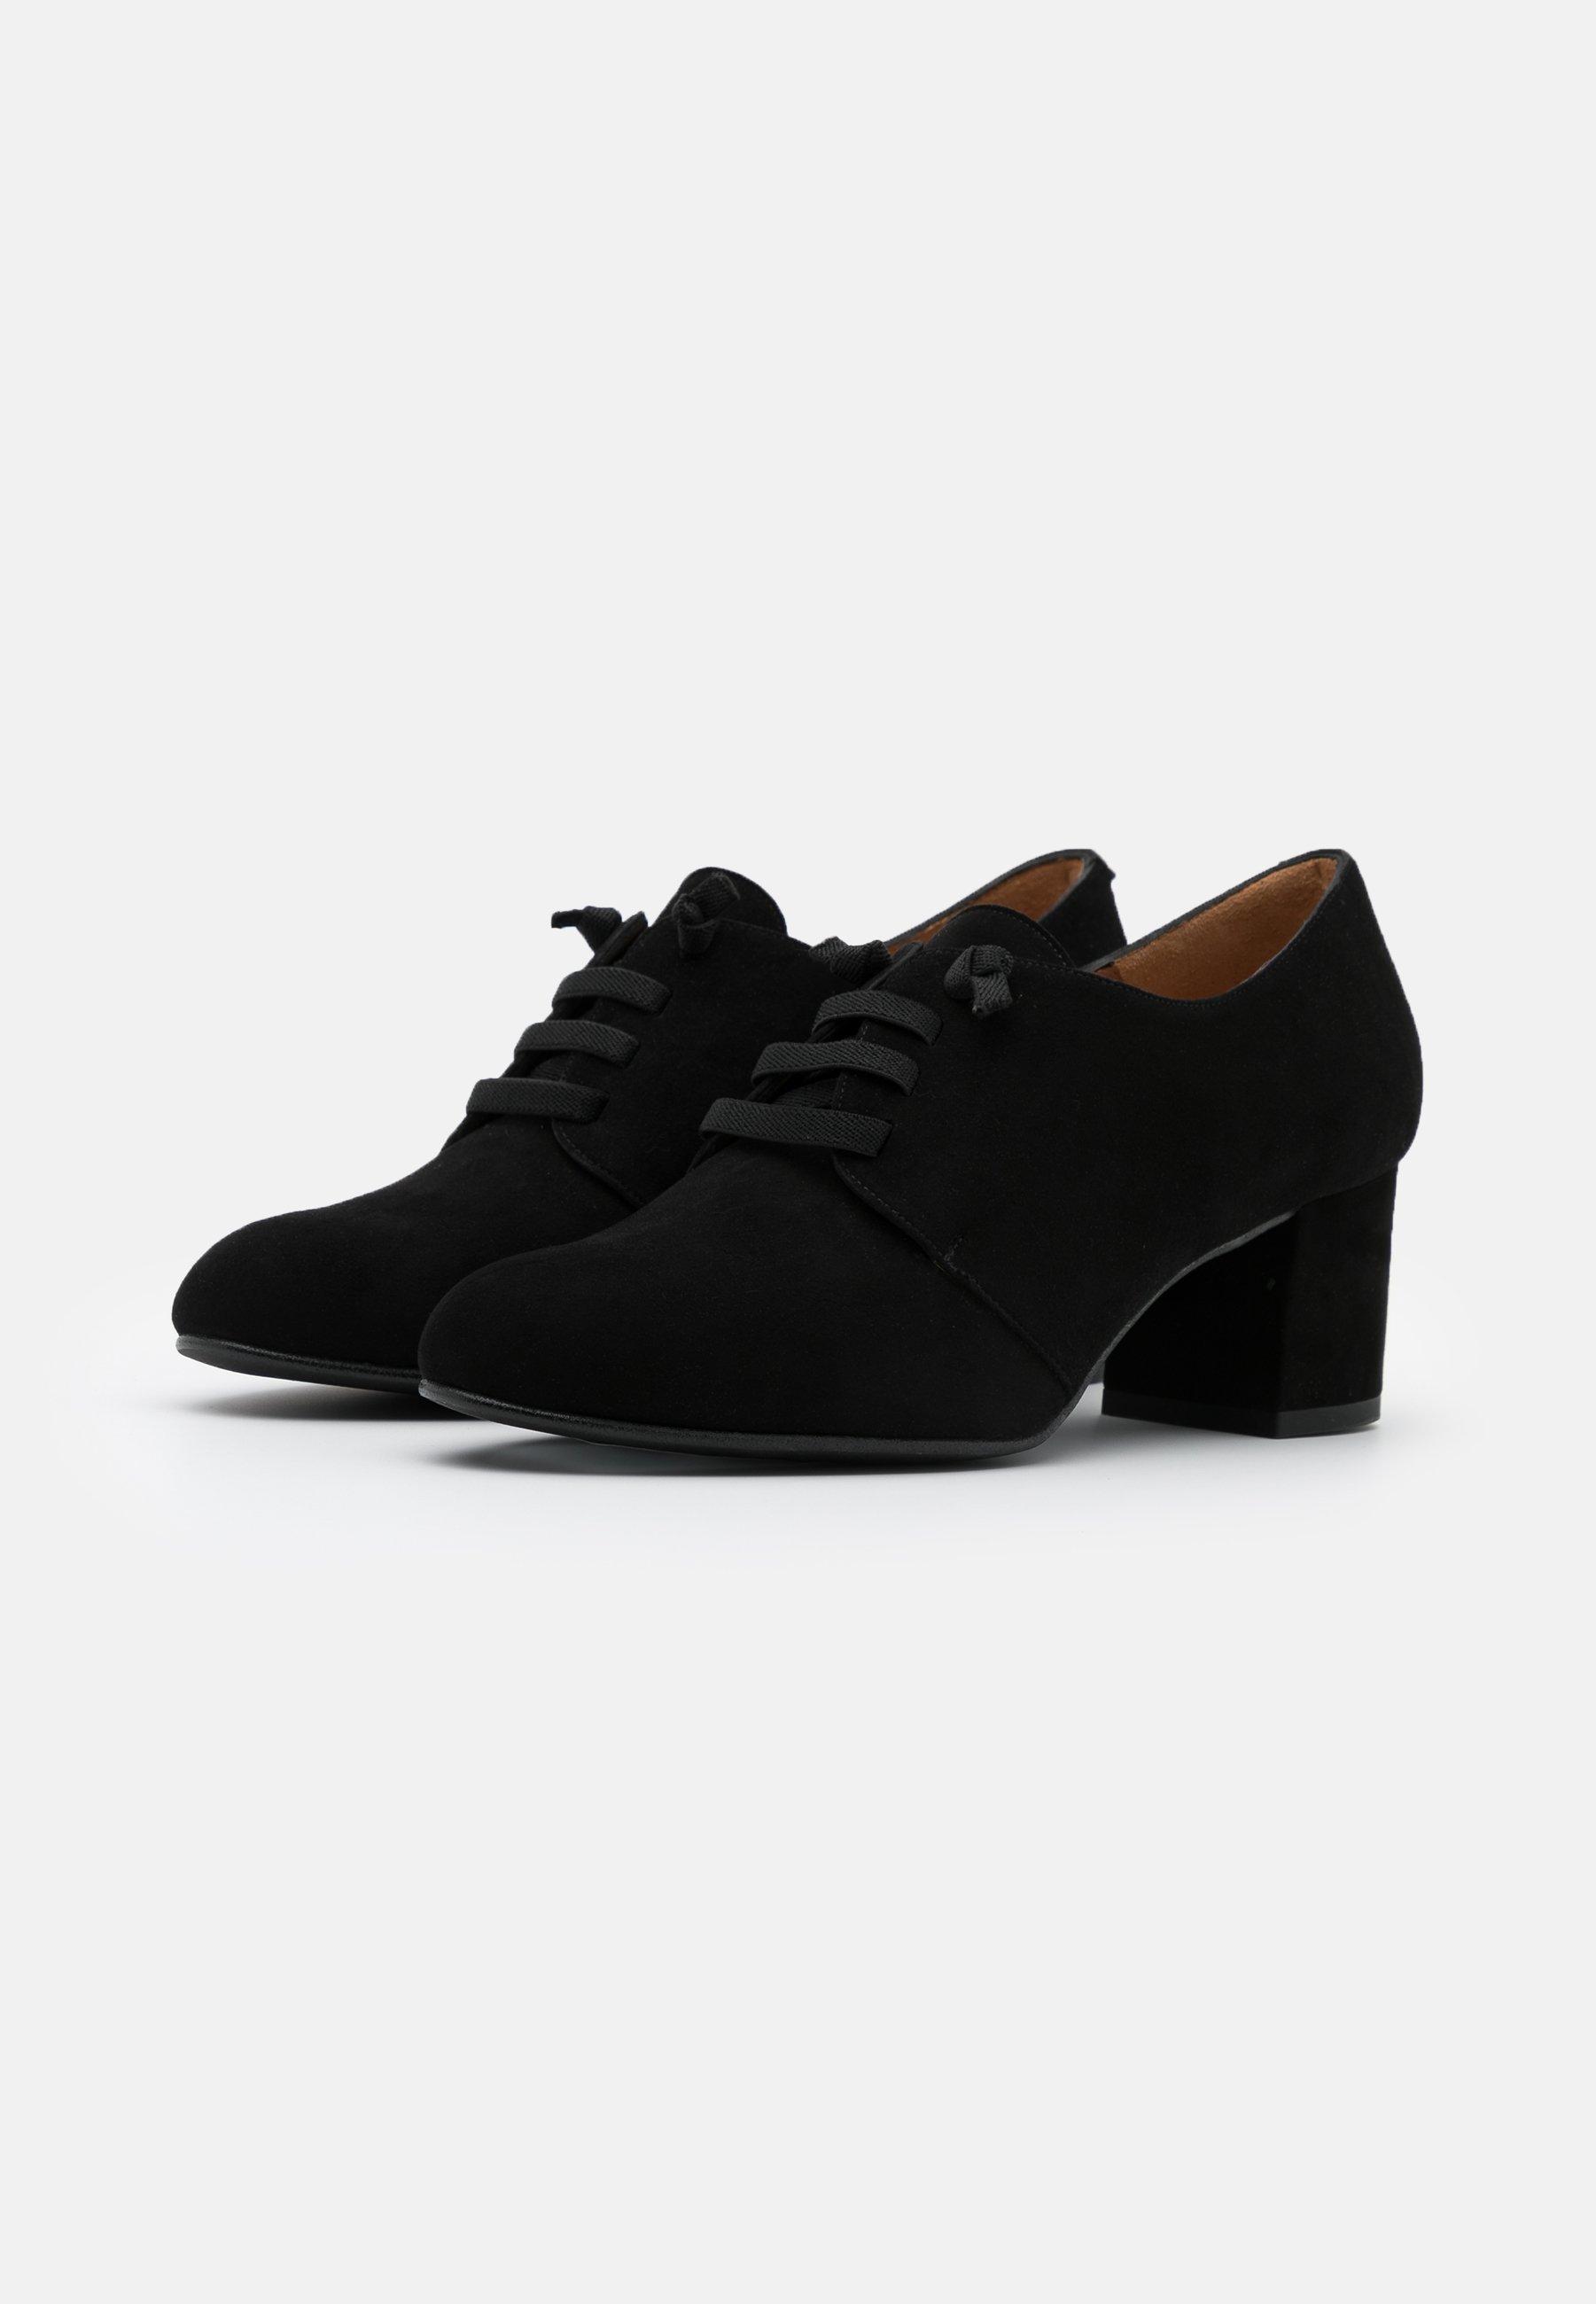 Outlet Store Fast Express Women's Shoes Brenda Zaro LAOS Lace-up heels black tPQPZPSRi p8WmRpmGN